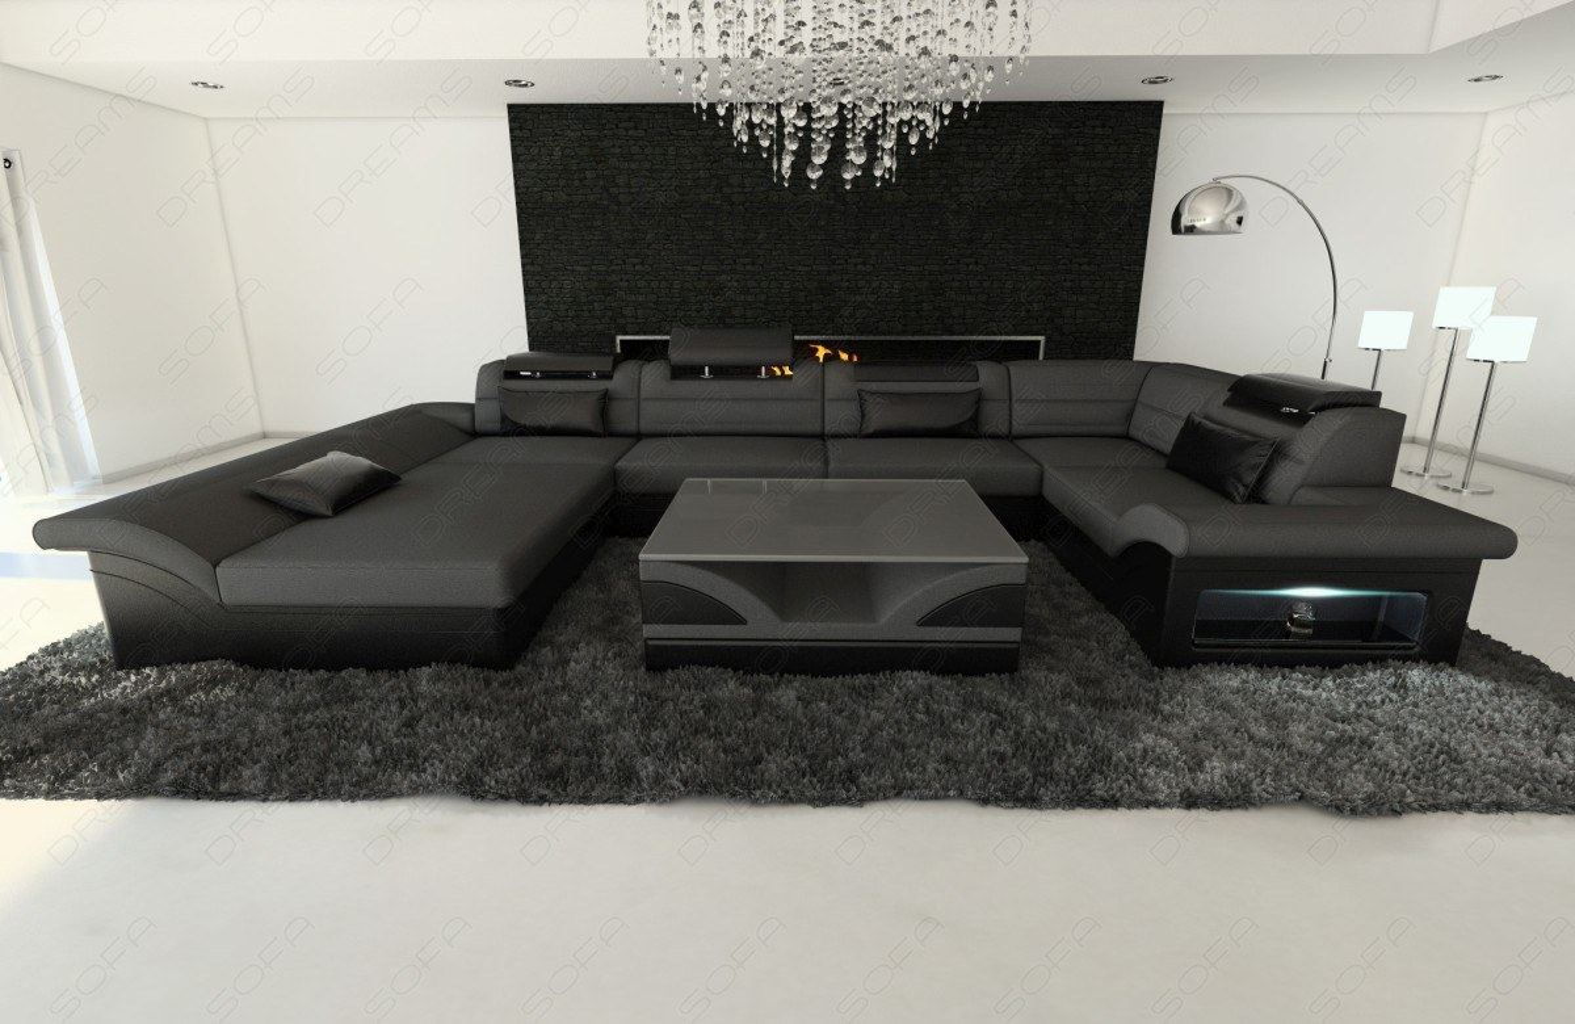 sofa atlanta led lights color selection material mix. Black Bedroom Furniture Sets. Home Design Ideas